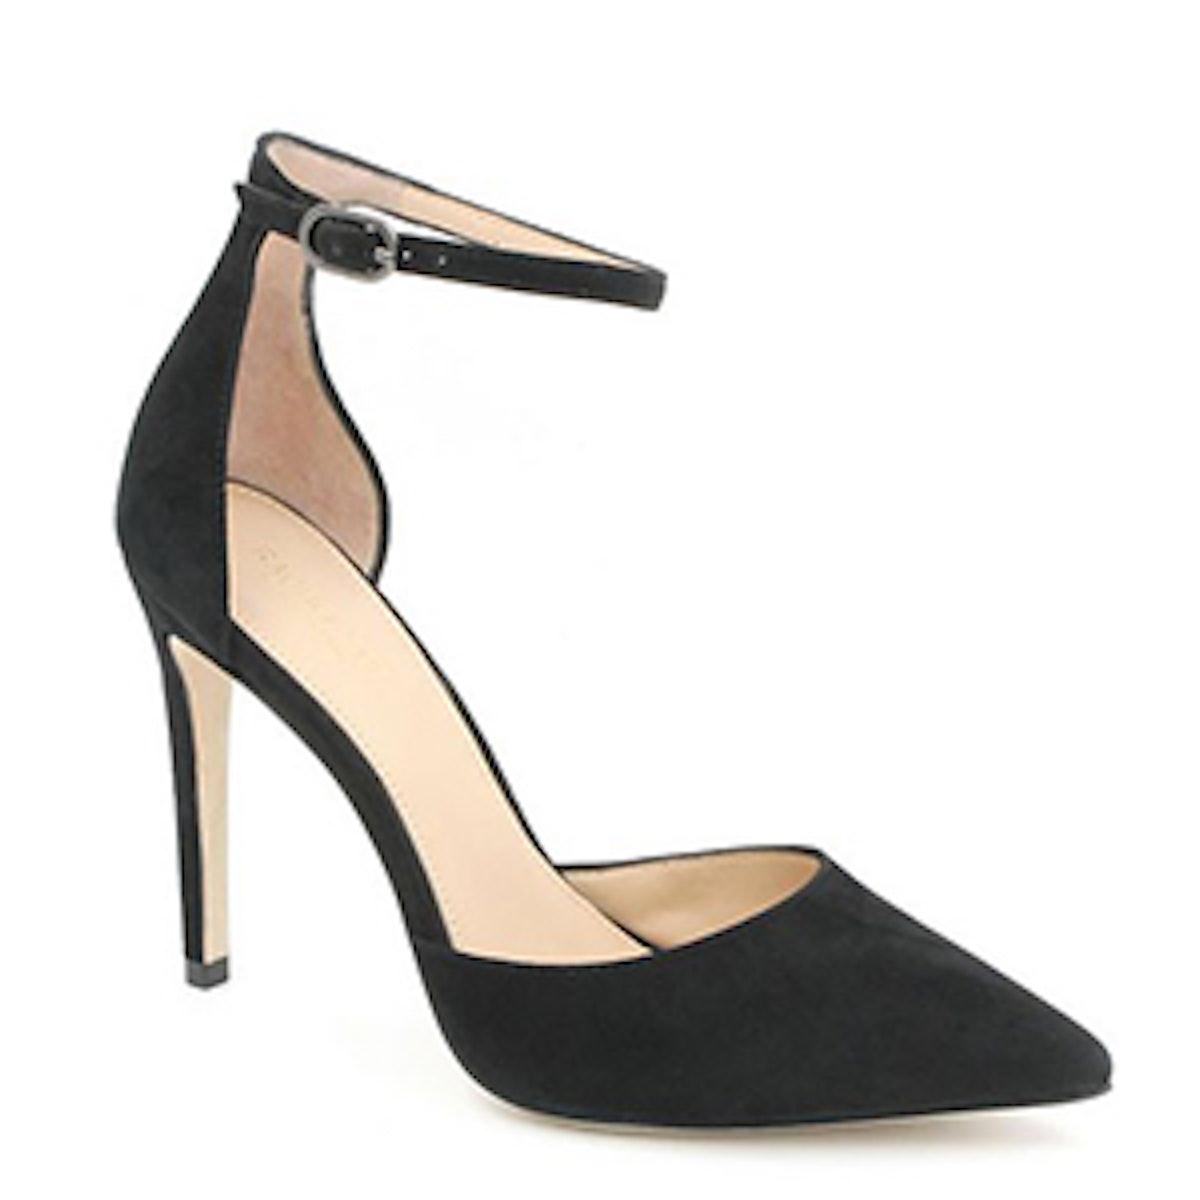 Hayworth Ankle-Strap Suede Pumps